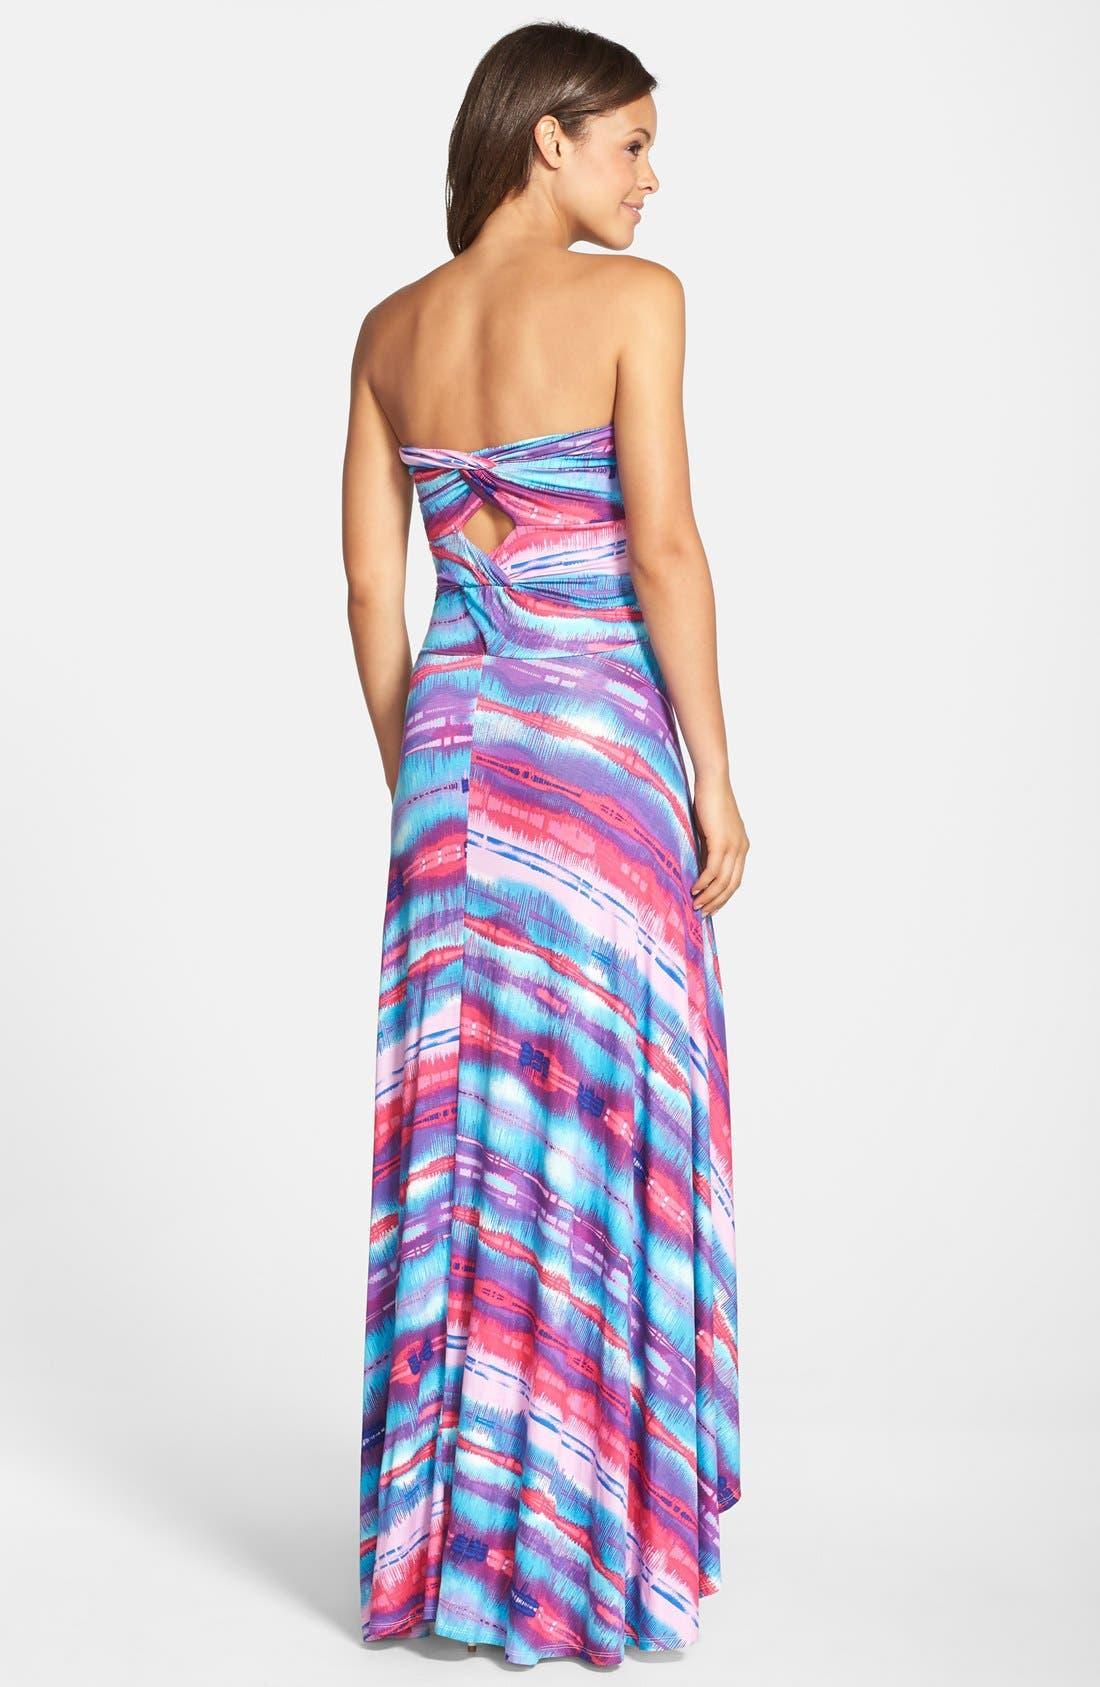 Strapless Neon Print Maxi Dress,                             Alternate thumbnail 8, color,                             429